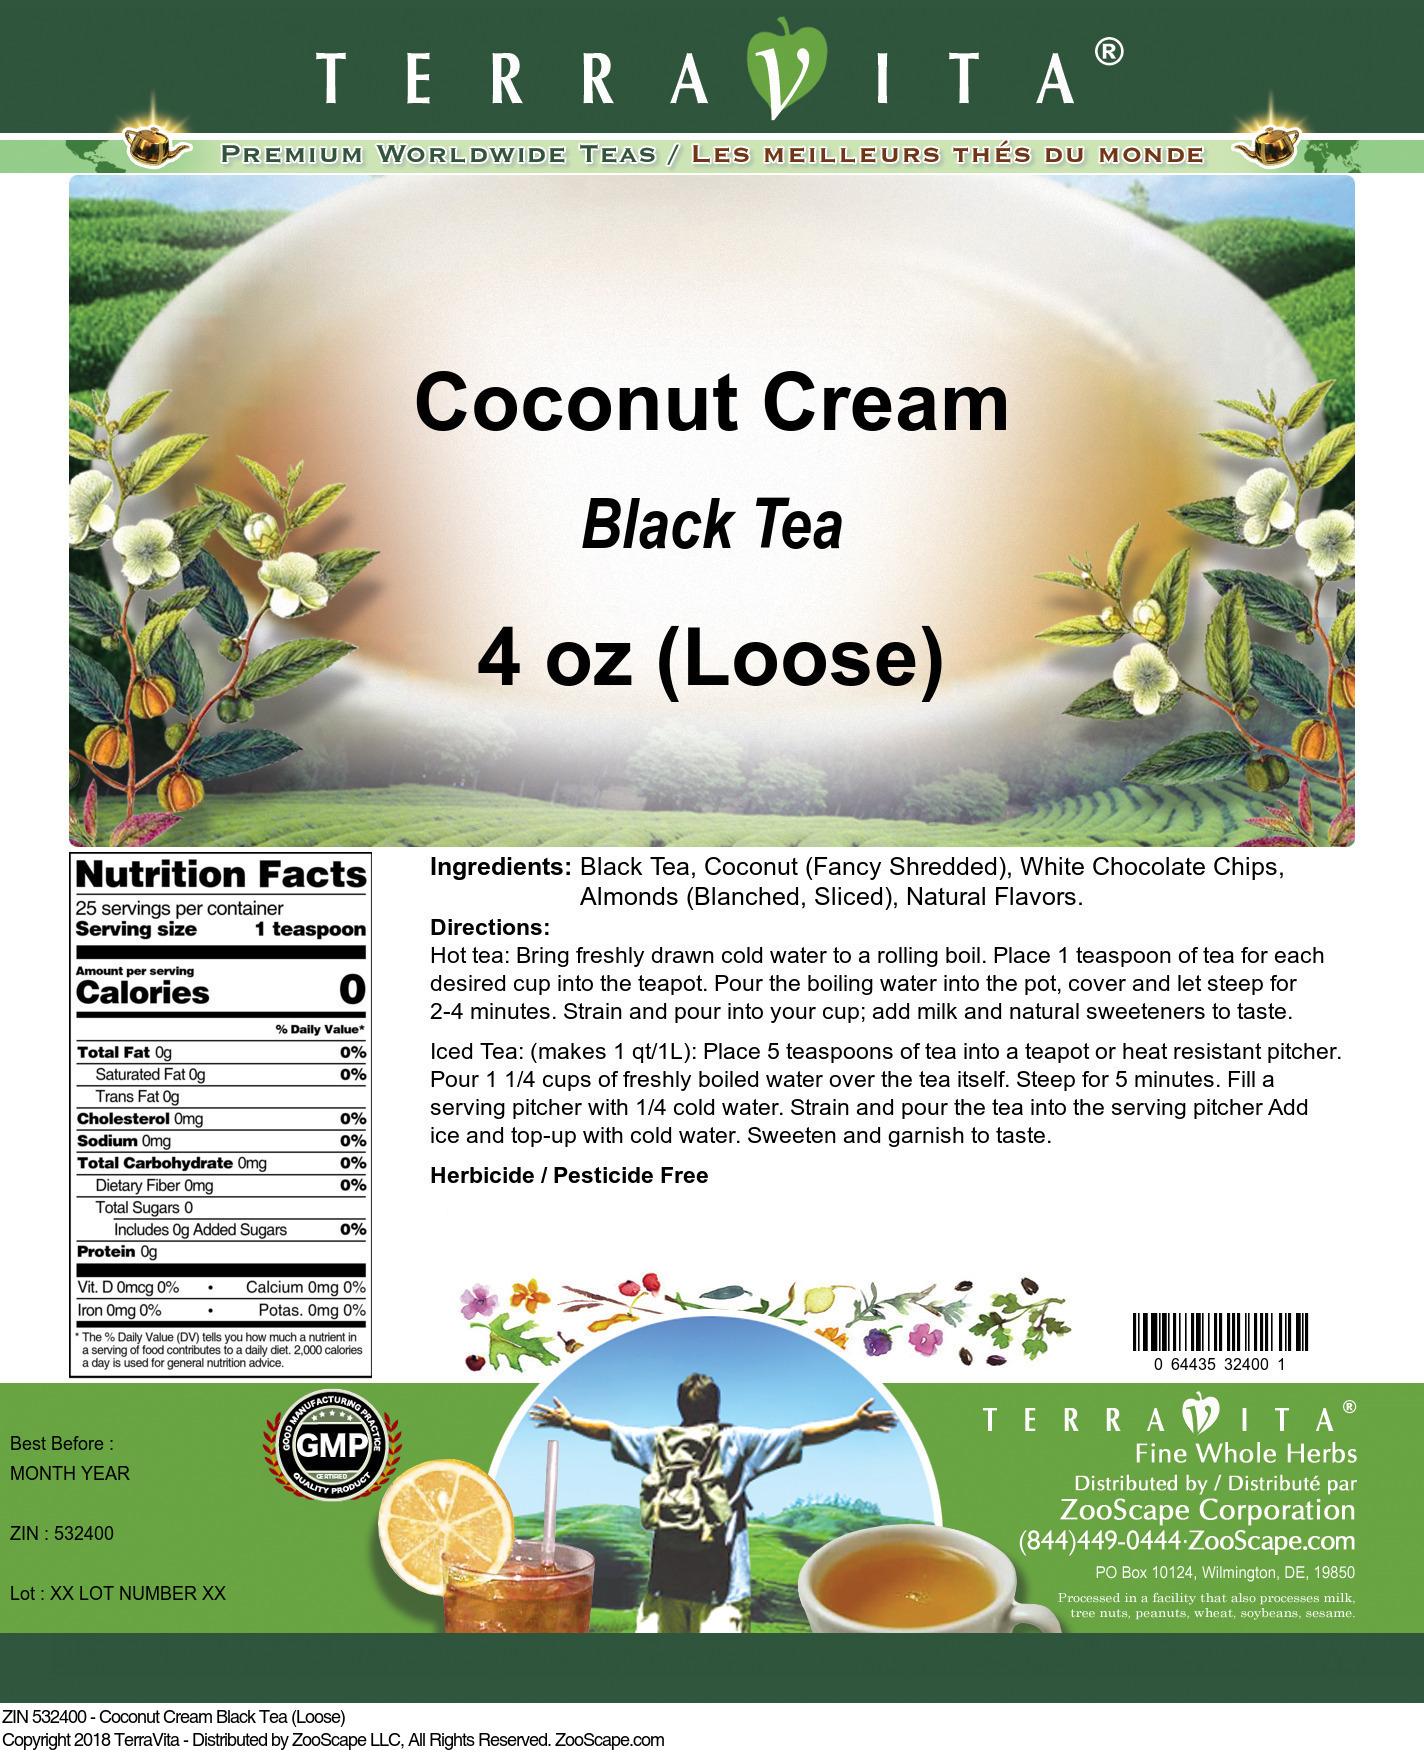 Coconut Cream Black Tea (Loose)